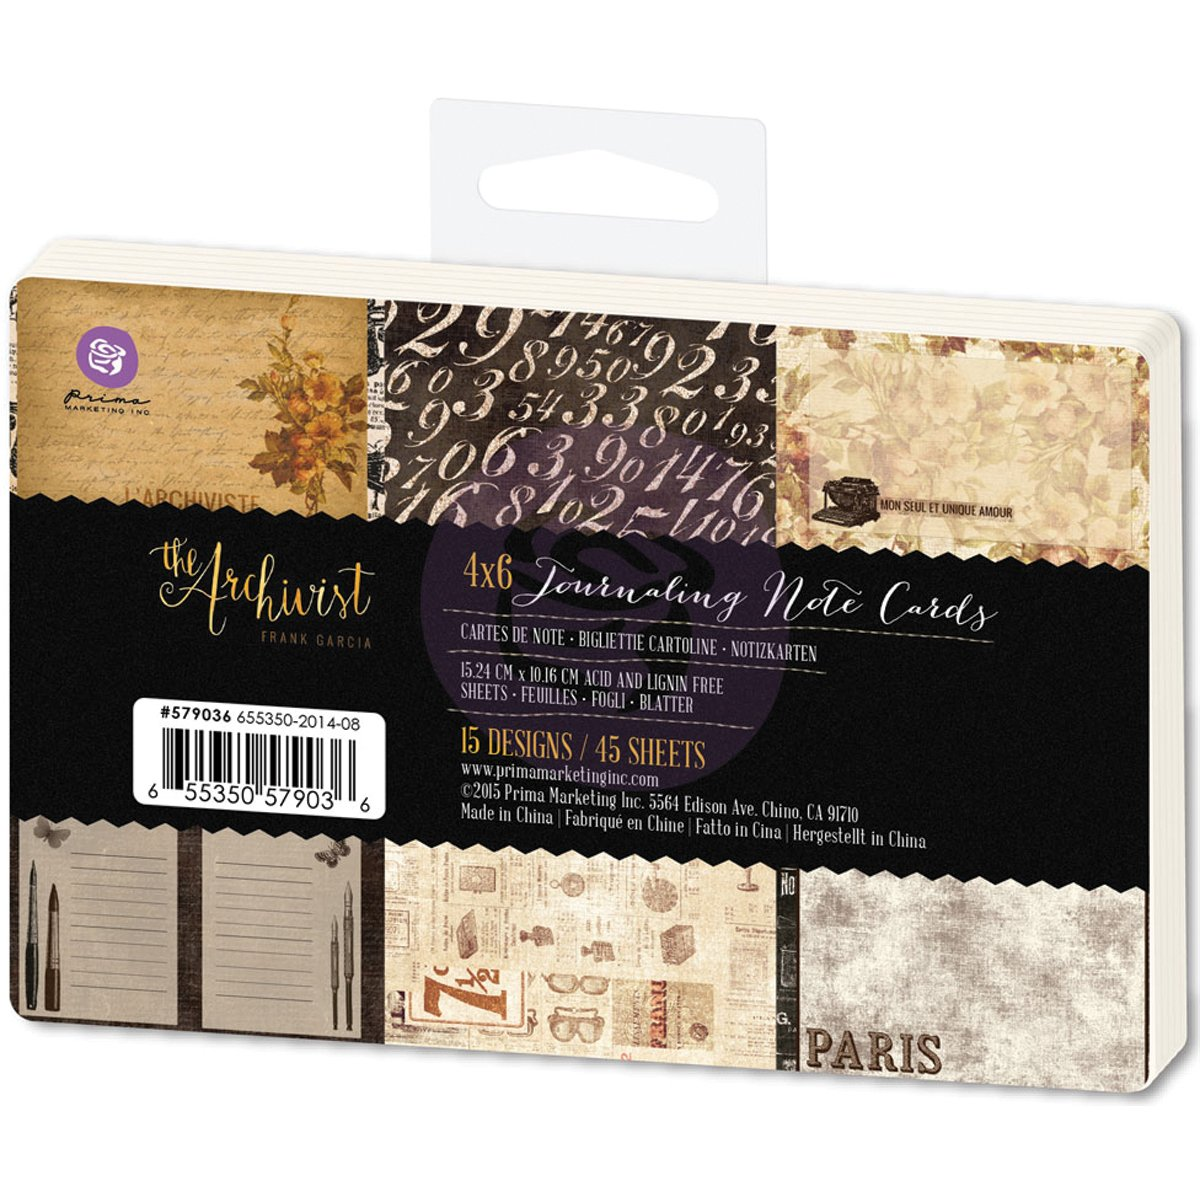 4 X 6 Prima Marketing 655350579036 The Archivist Journaling Notecards Pad